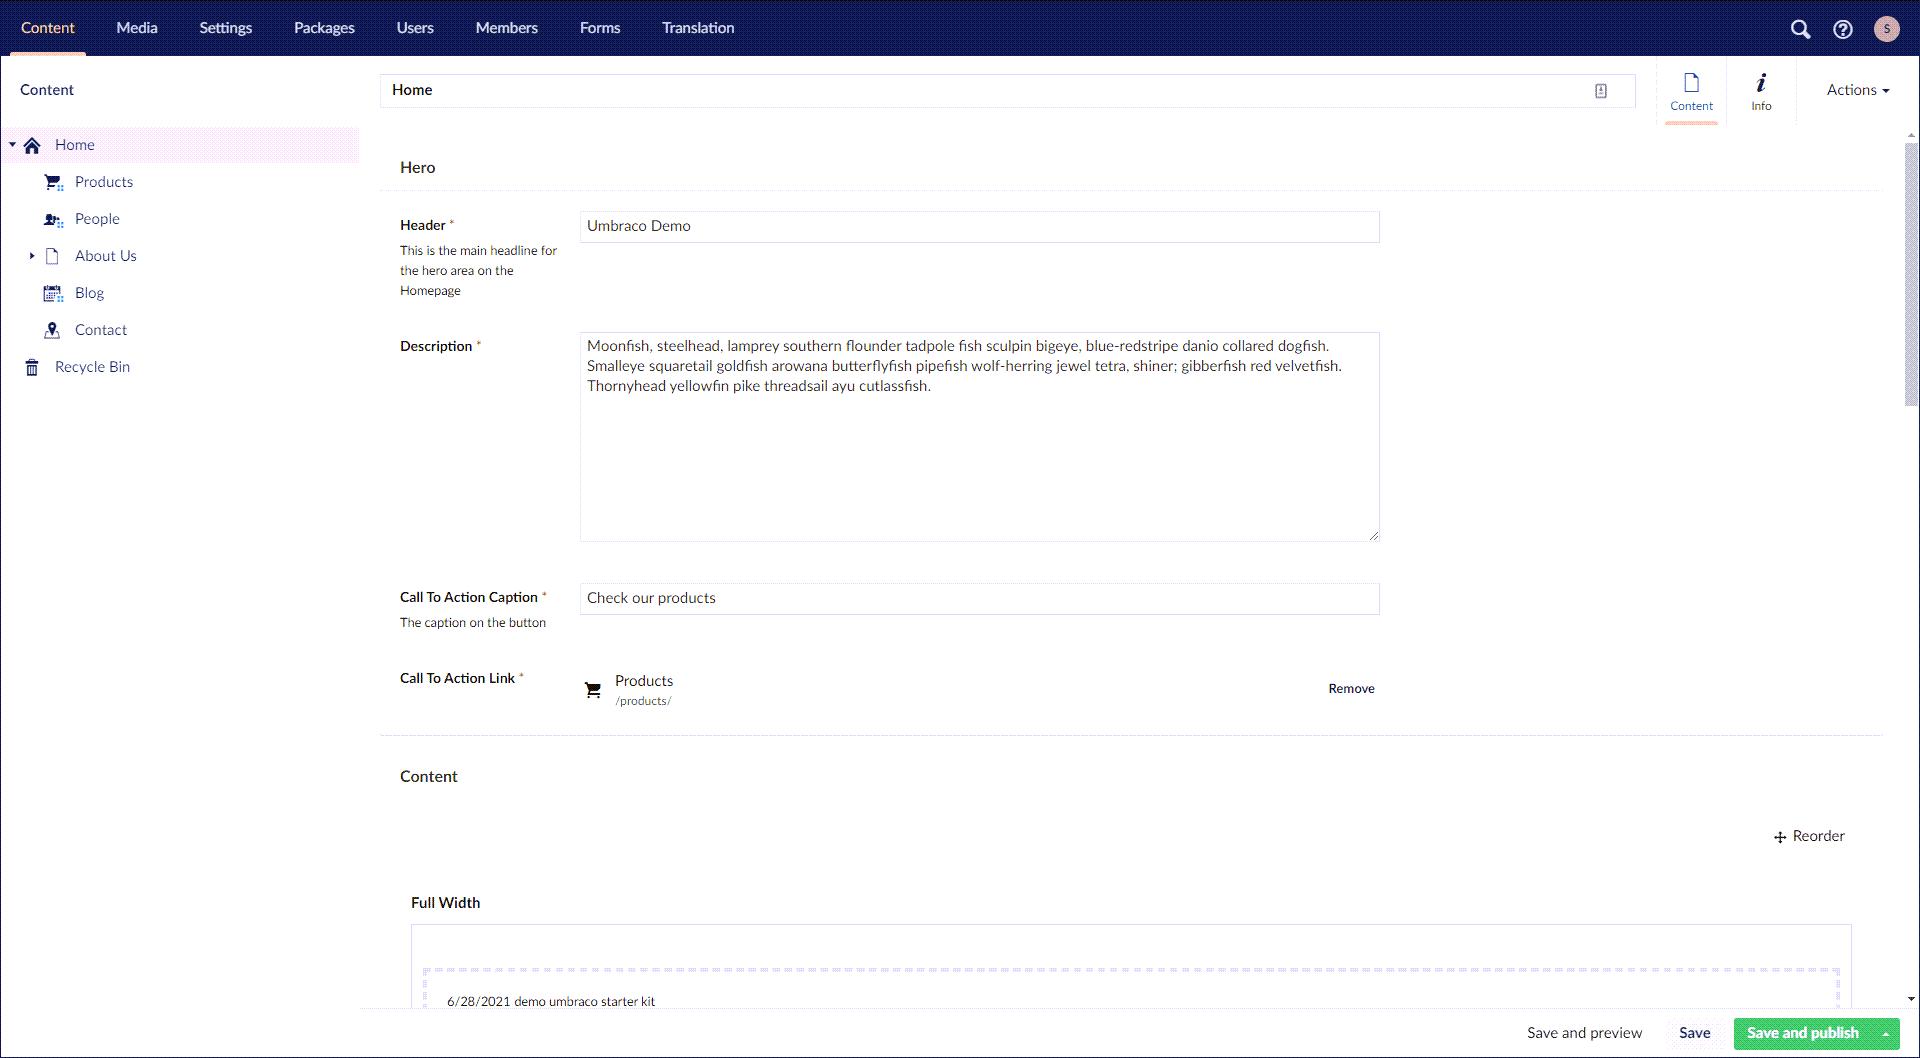 Umbraco CMS screenshot (620 pix)